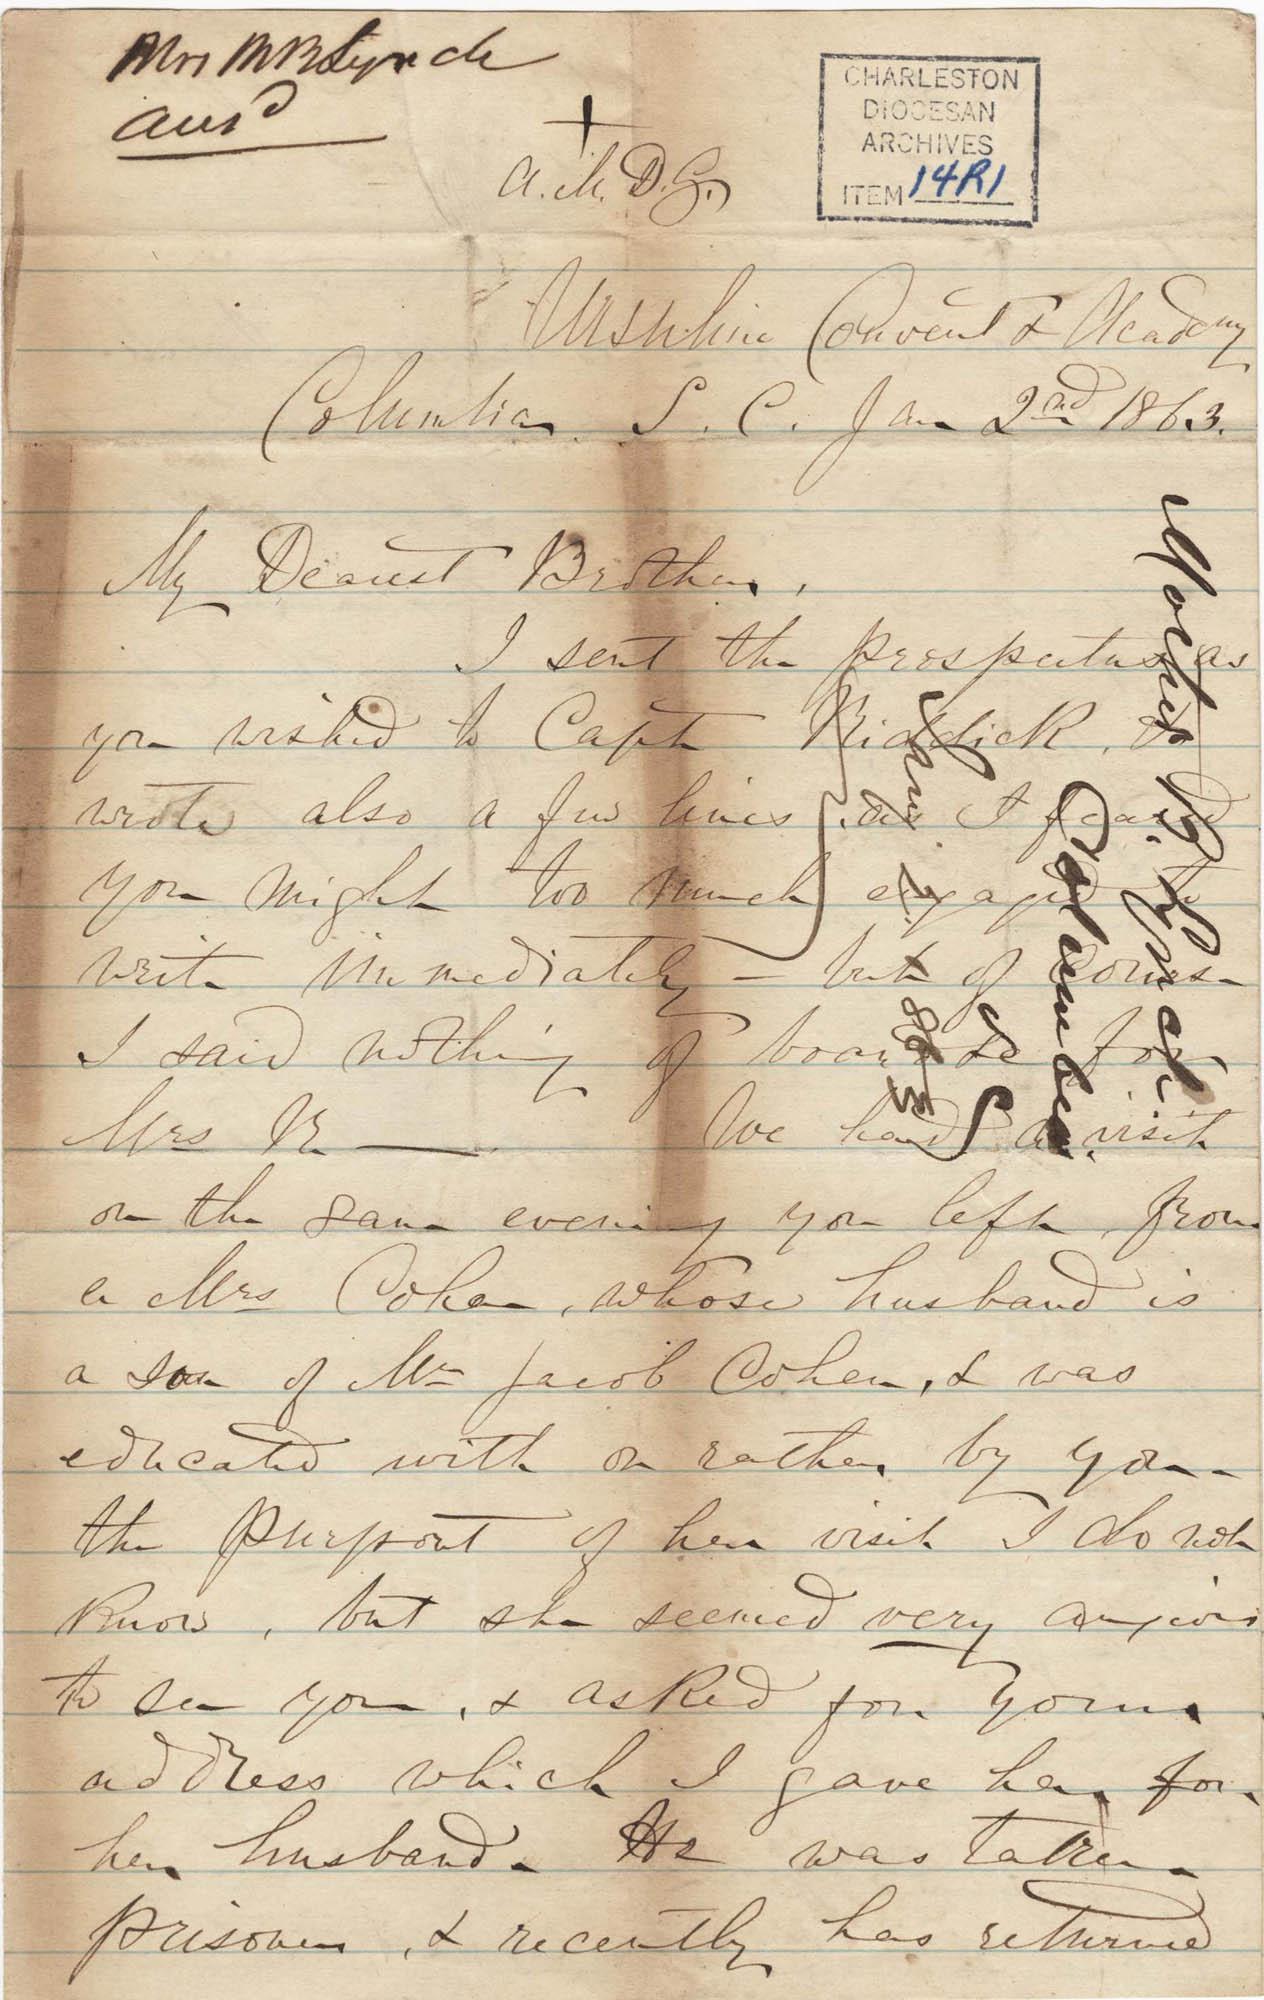 256. Madame Baptiste to Bp Patrick Lynch -- January 2, 1863